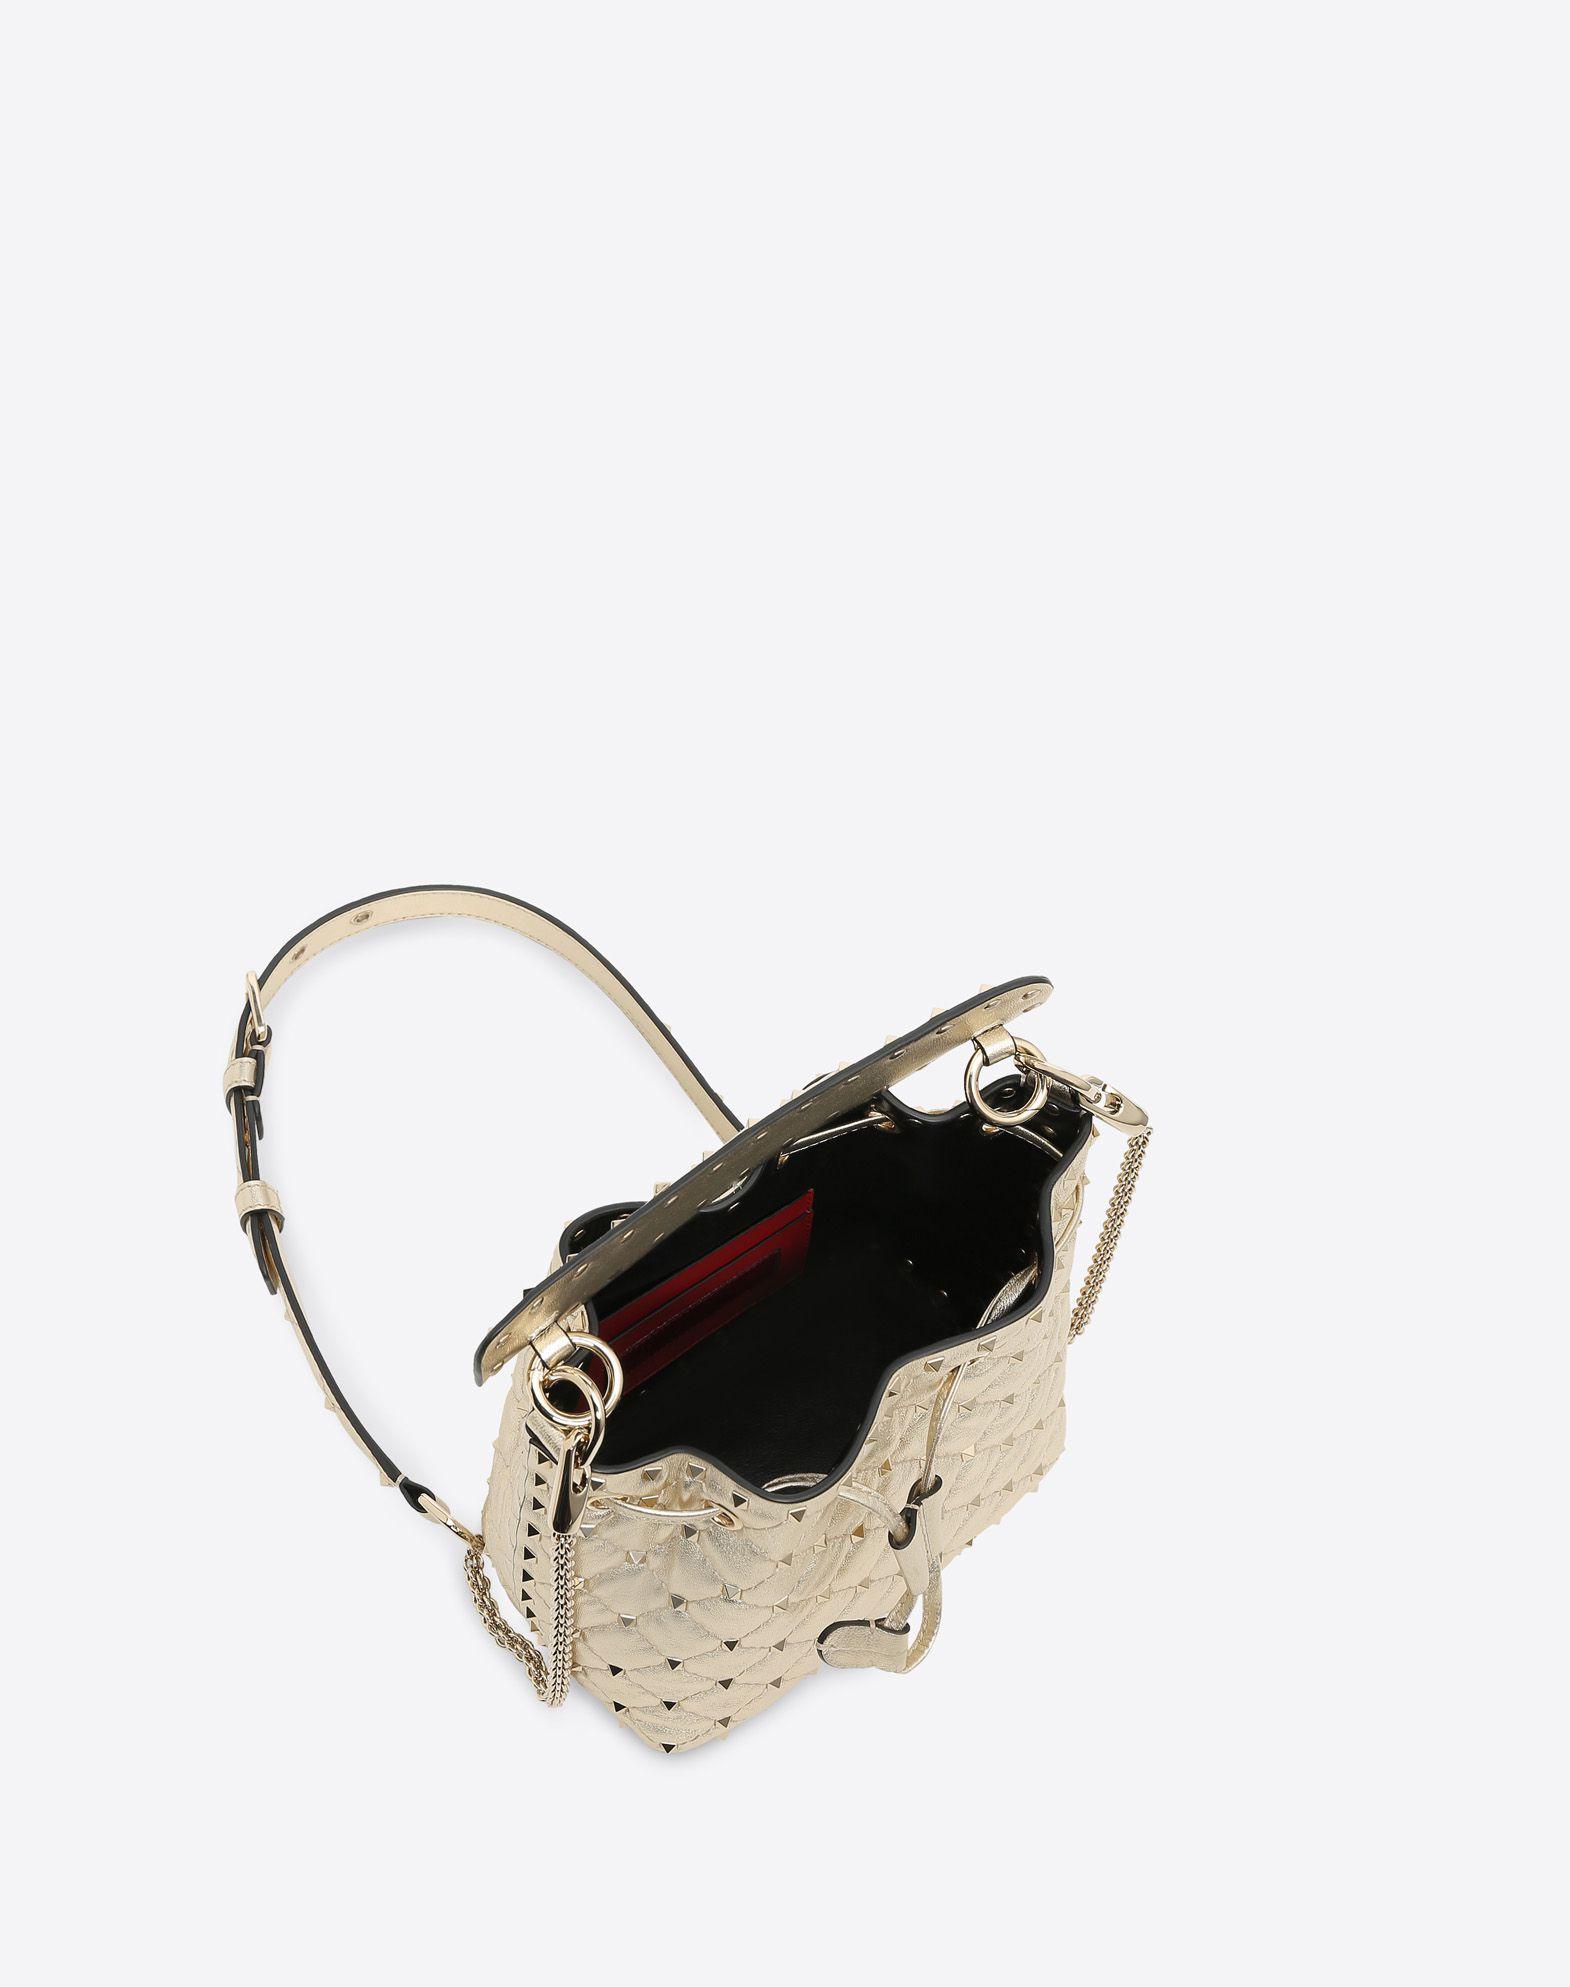 VALENTINO GARAVANI Rockstud Spike Small Bucket Bag  BUCKET BAG D e